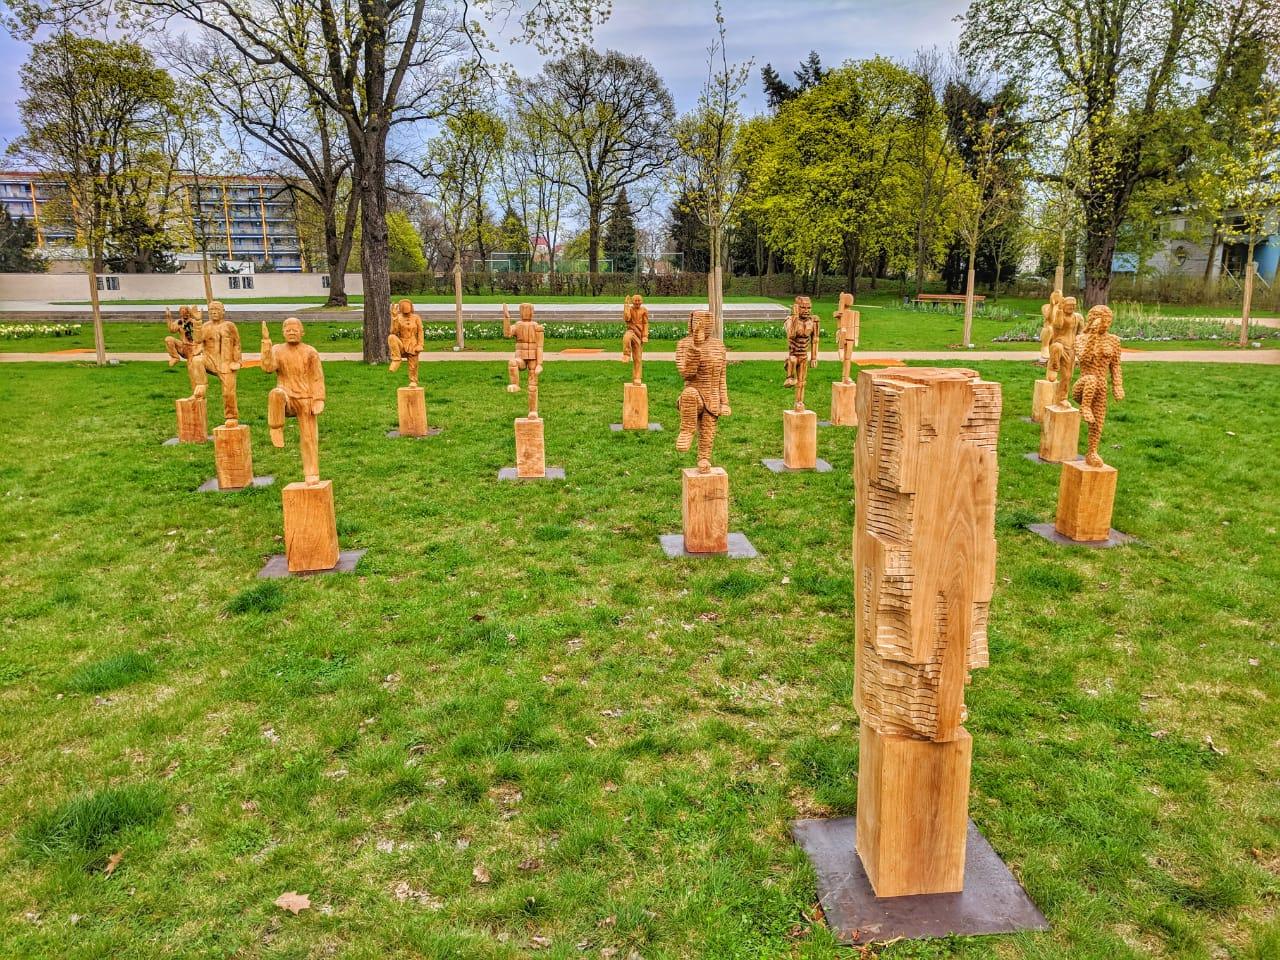 Full Size of Gartenskulpturen Holz Selber Machen Kaufen Skulpturen Aus Gartenskulptur Stein Und Glas Garten Holzskulpturen Vom Kettensgenknstler Modulküche Holzregal Wohnzimmer Gartenskulpturen Holz